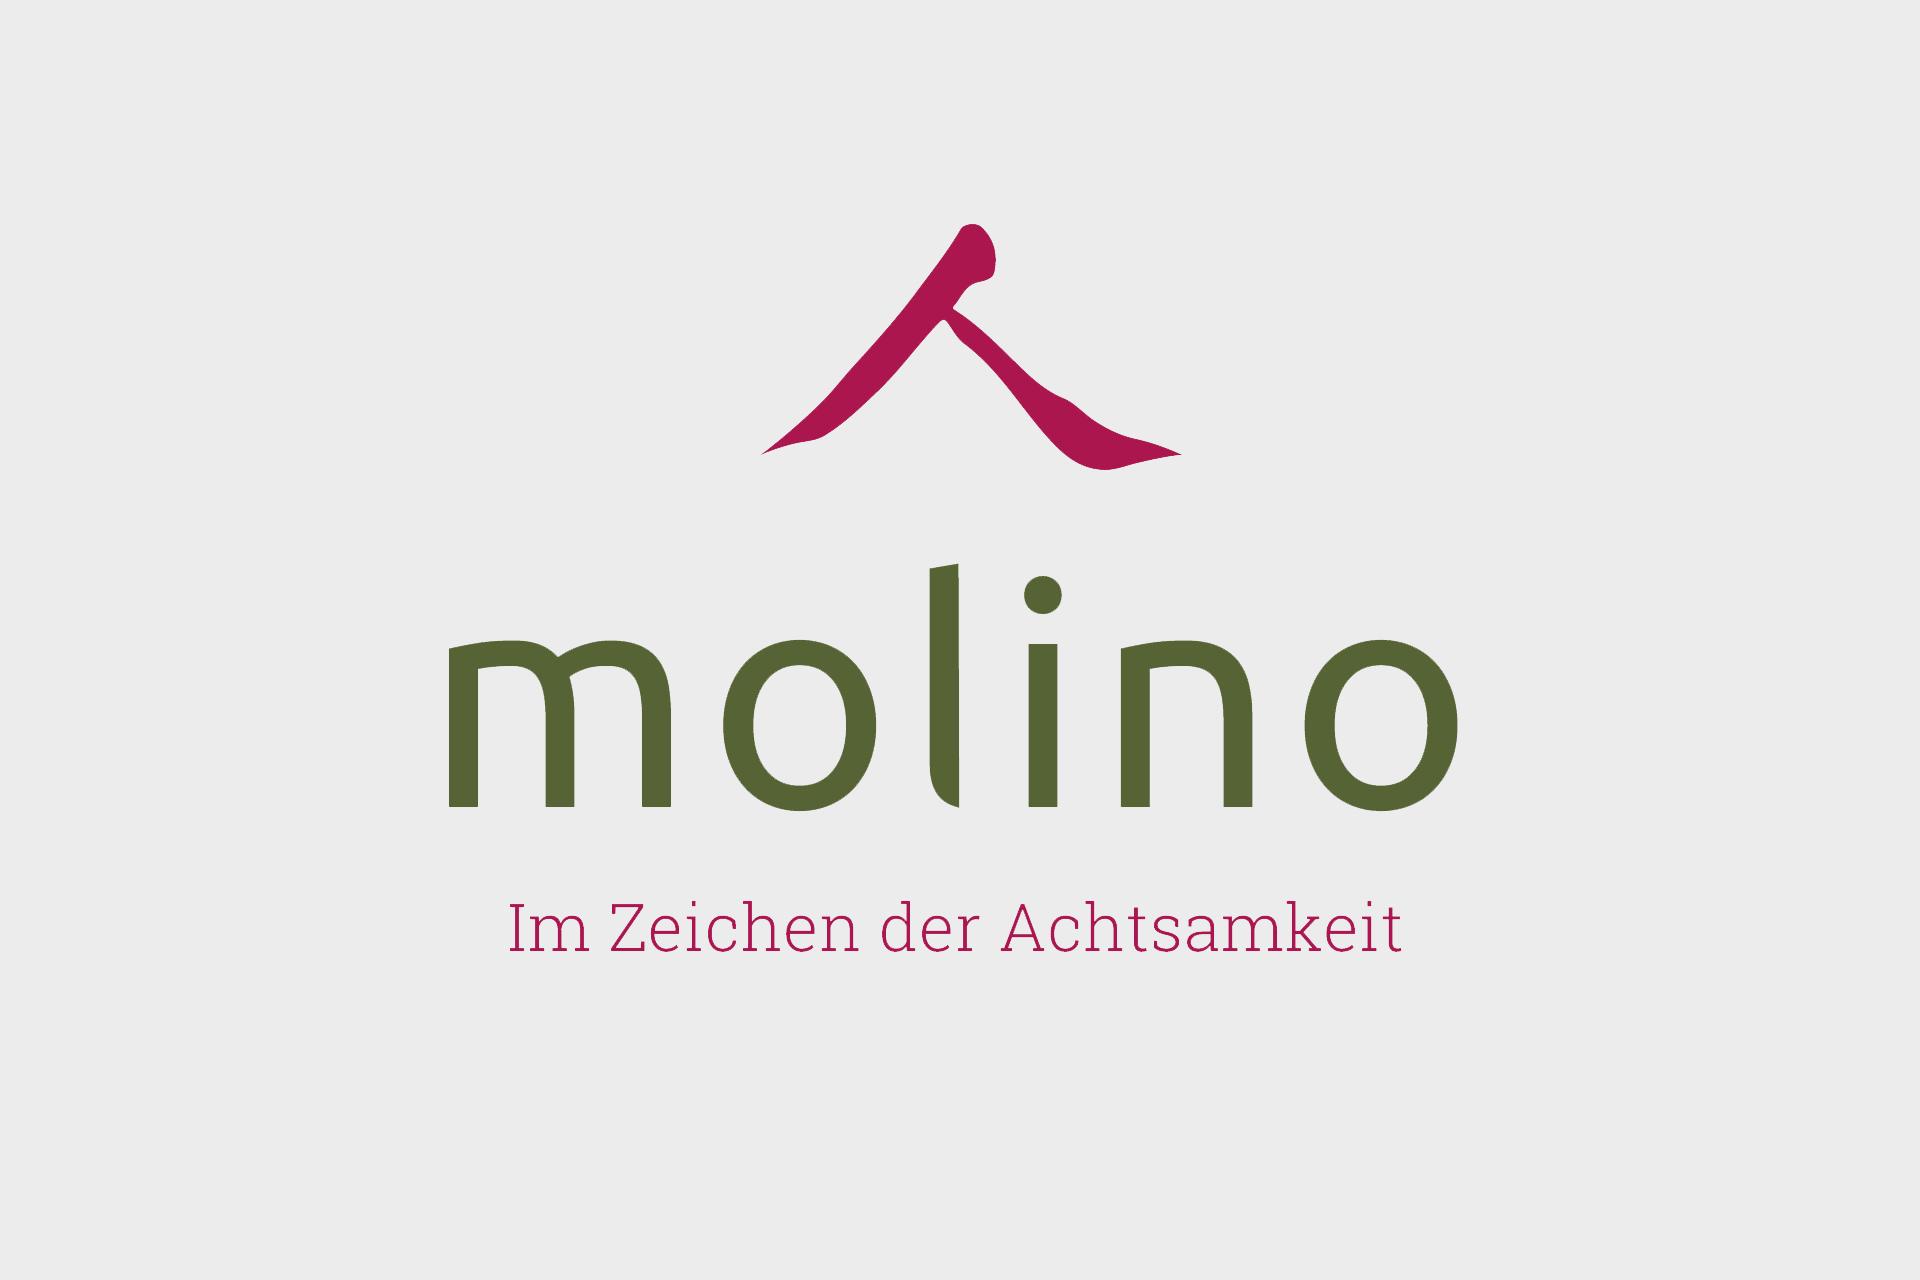 Logo-Design, molino, Design, Logo, Münster, Grafik, Studio, Auckz